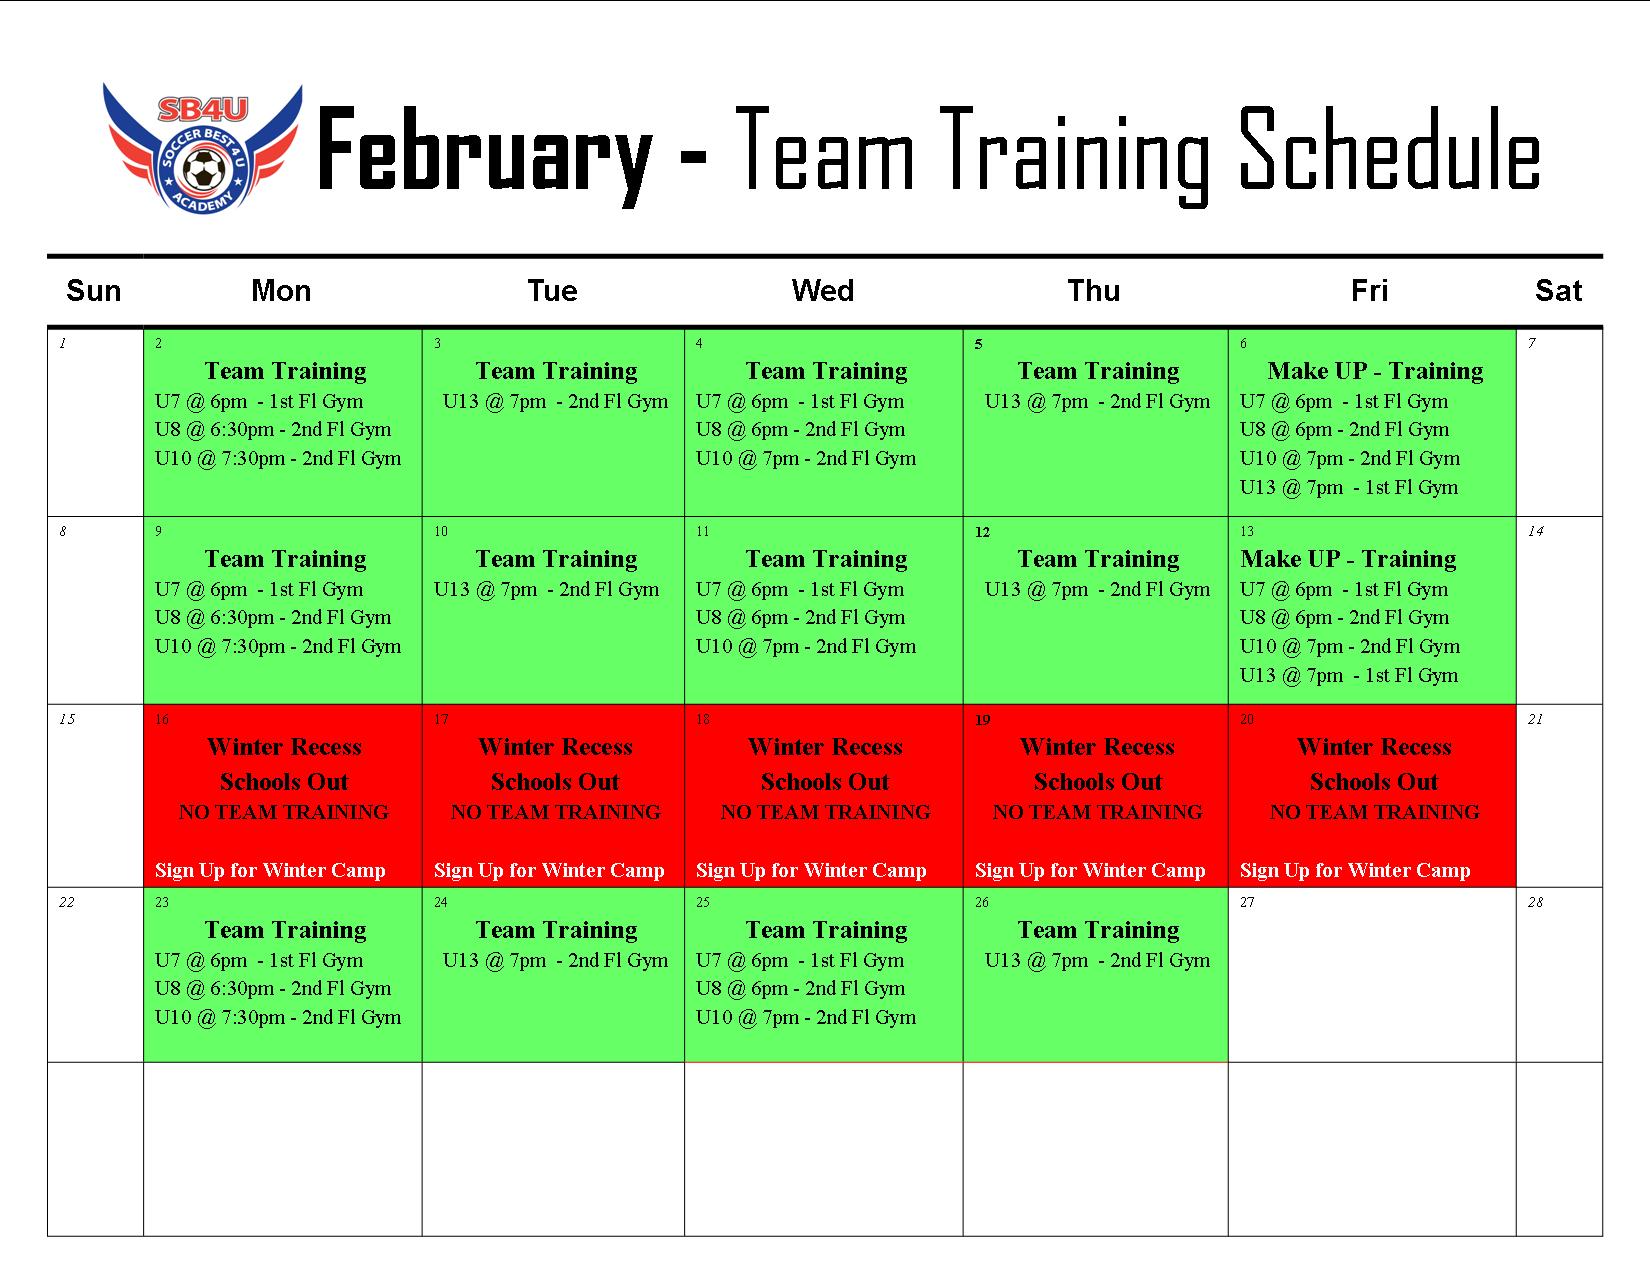 February Team Training Calendar - Updated